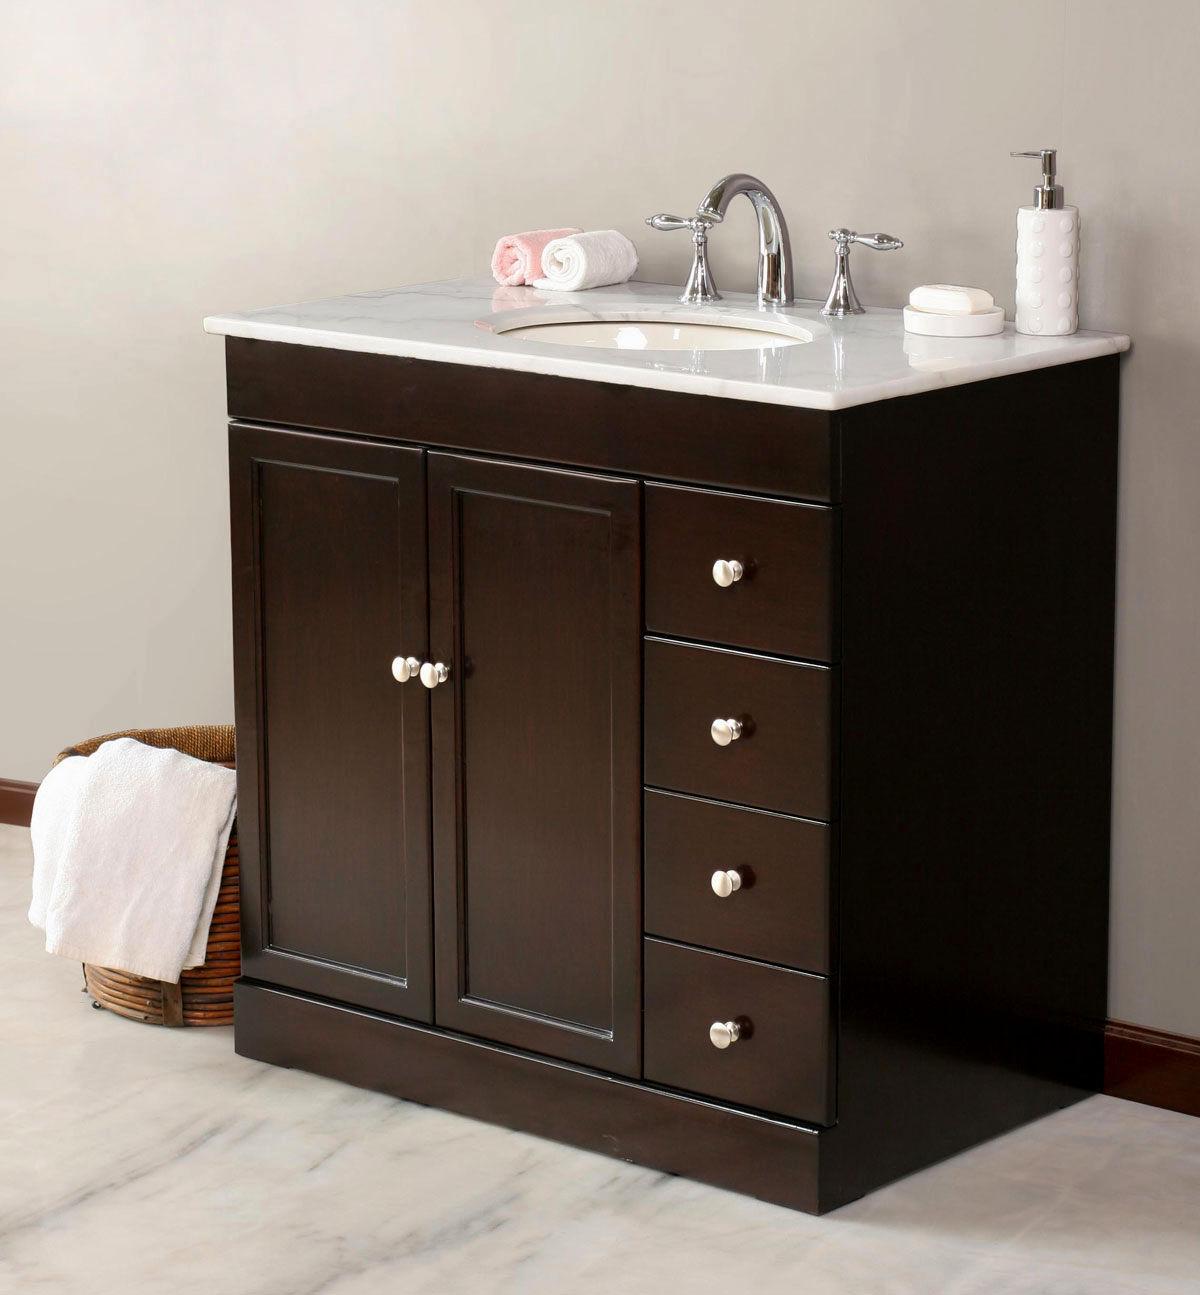 amazing bathroom vanity 36 inch design-Top Bathroom Vanity 36 Inch Gallery